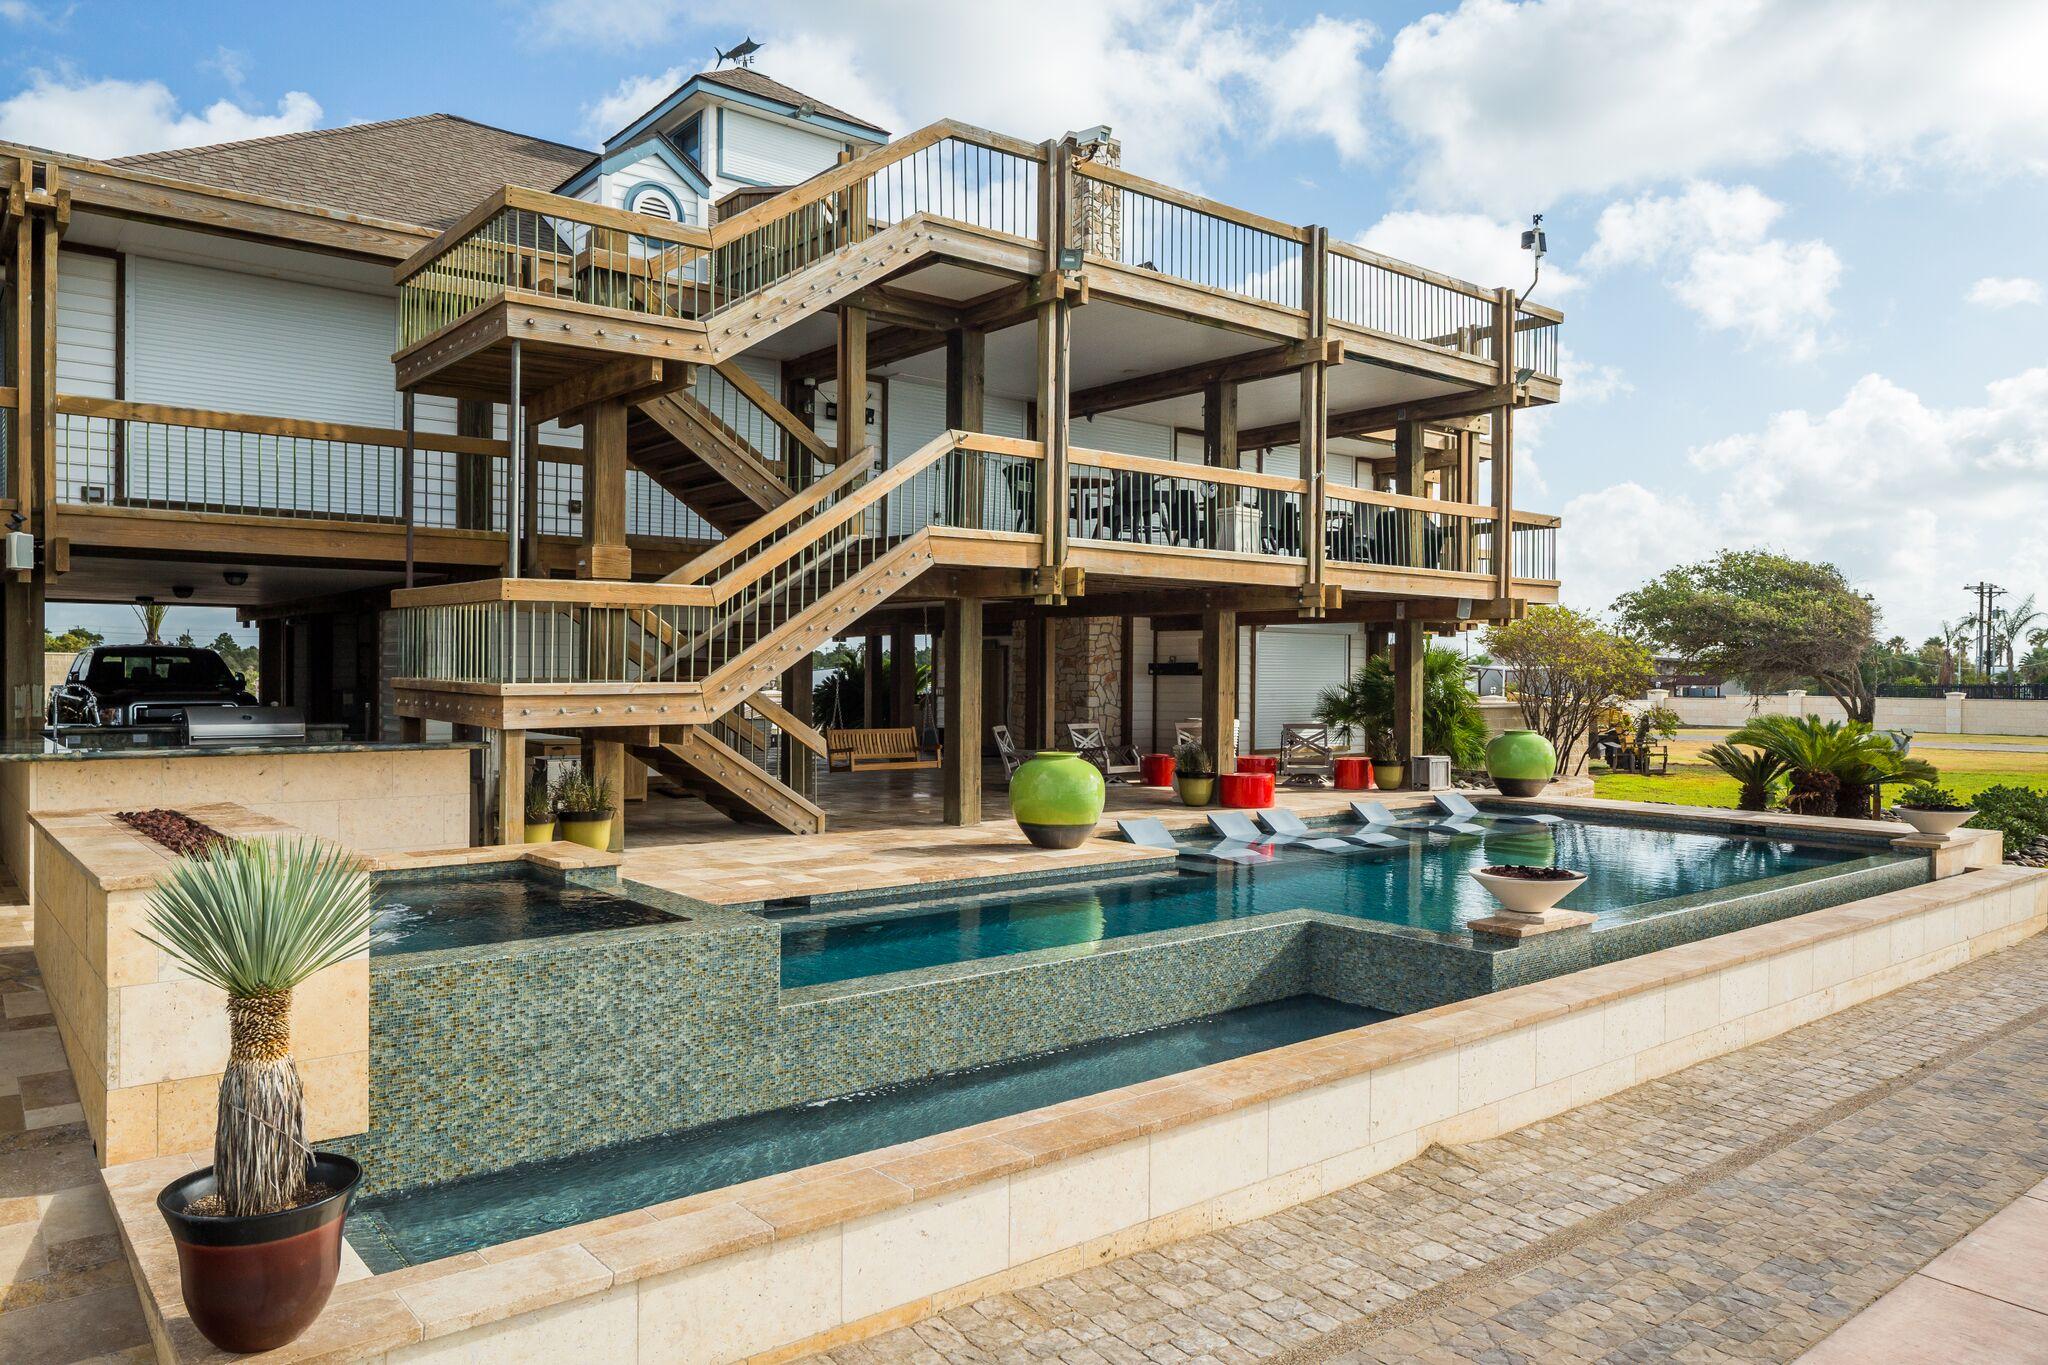 Custom Pool Builder near Galveston